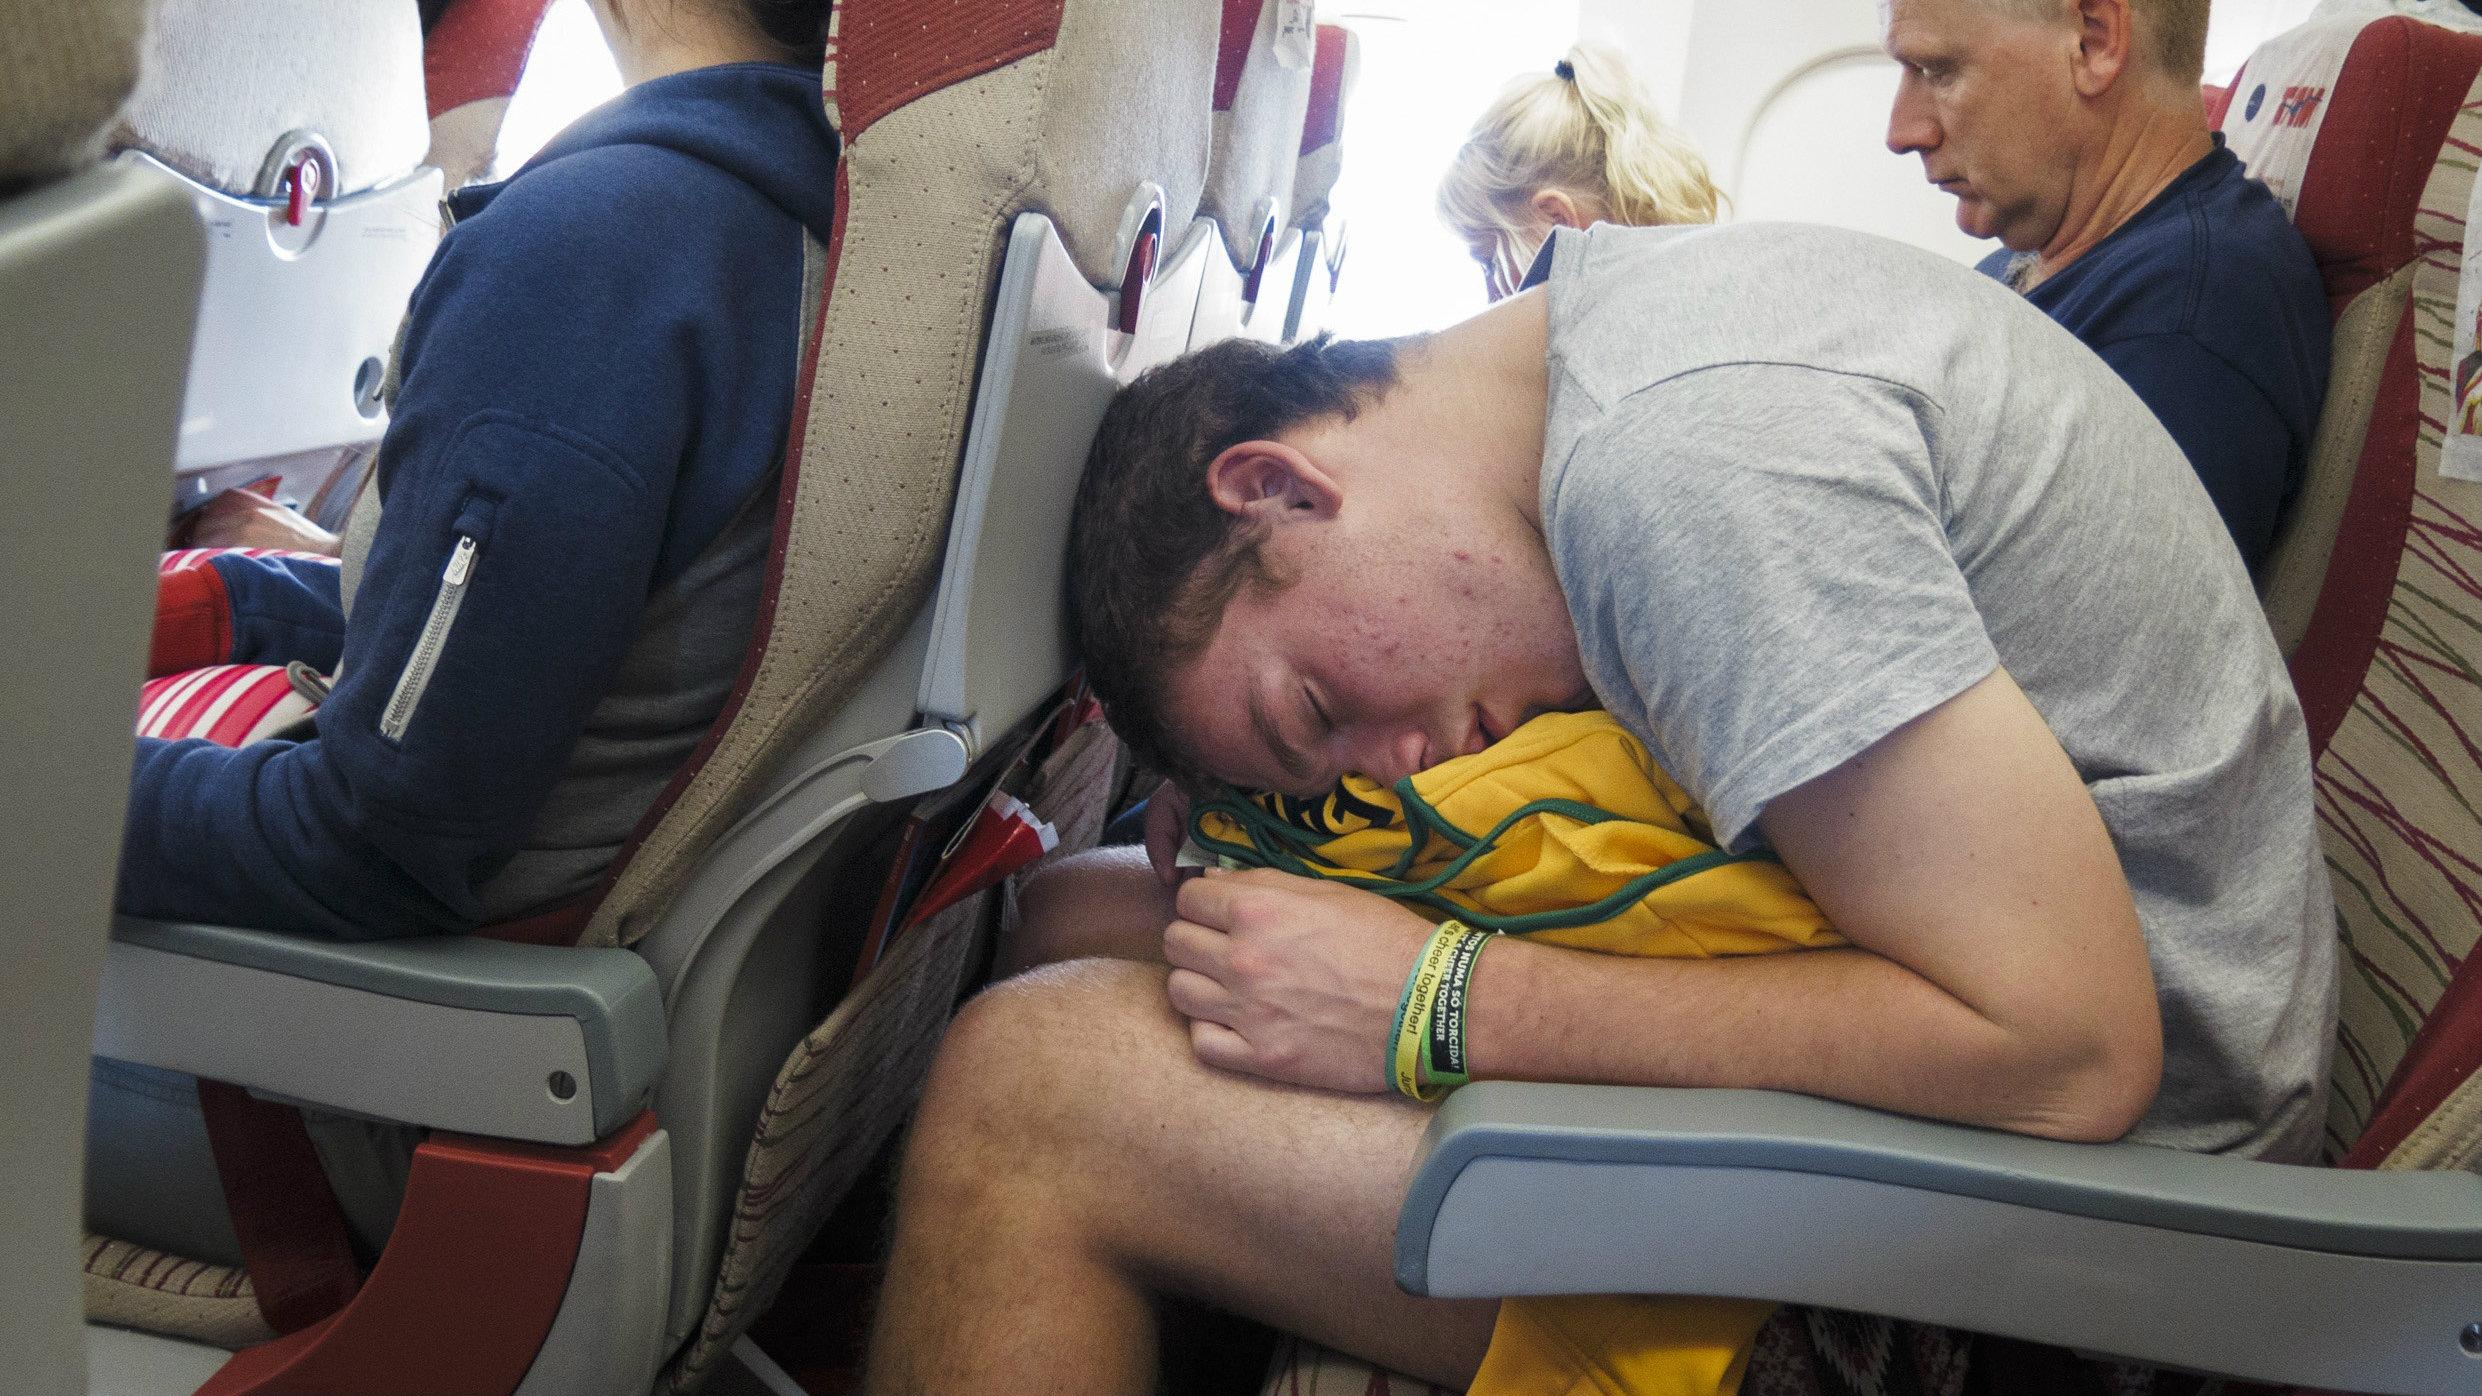 man on airplane